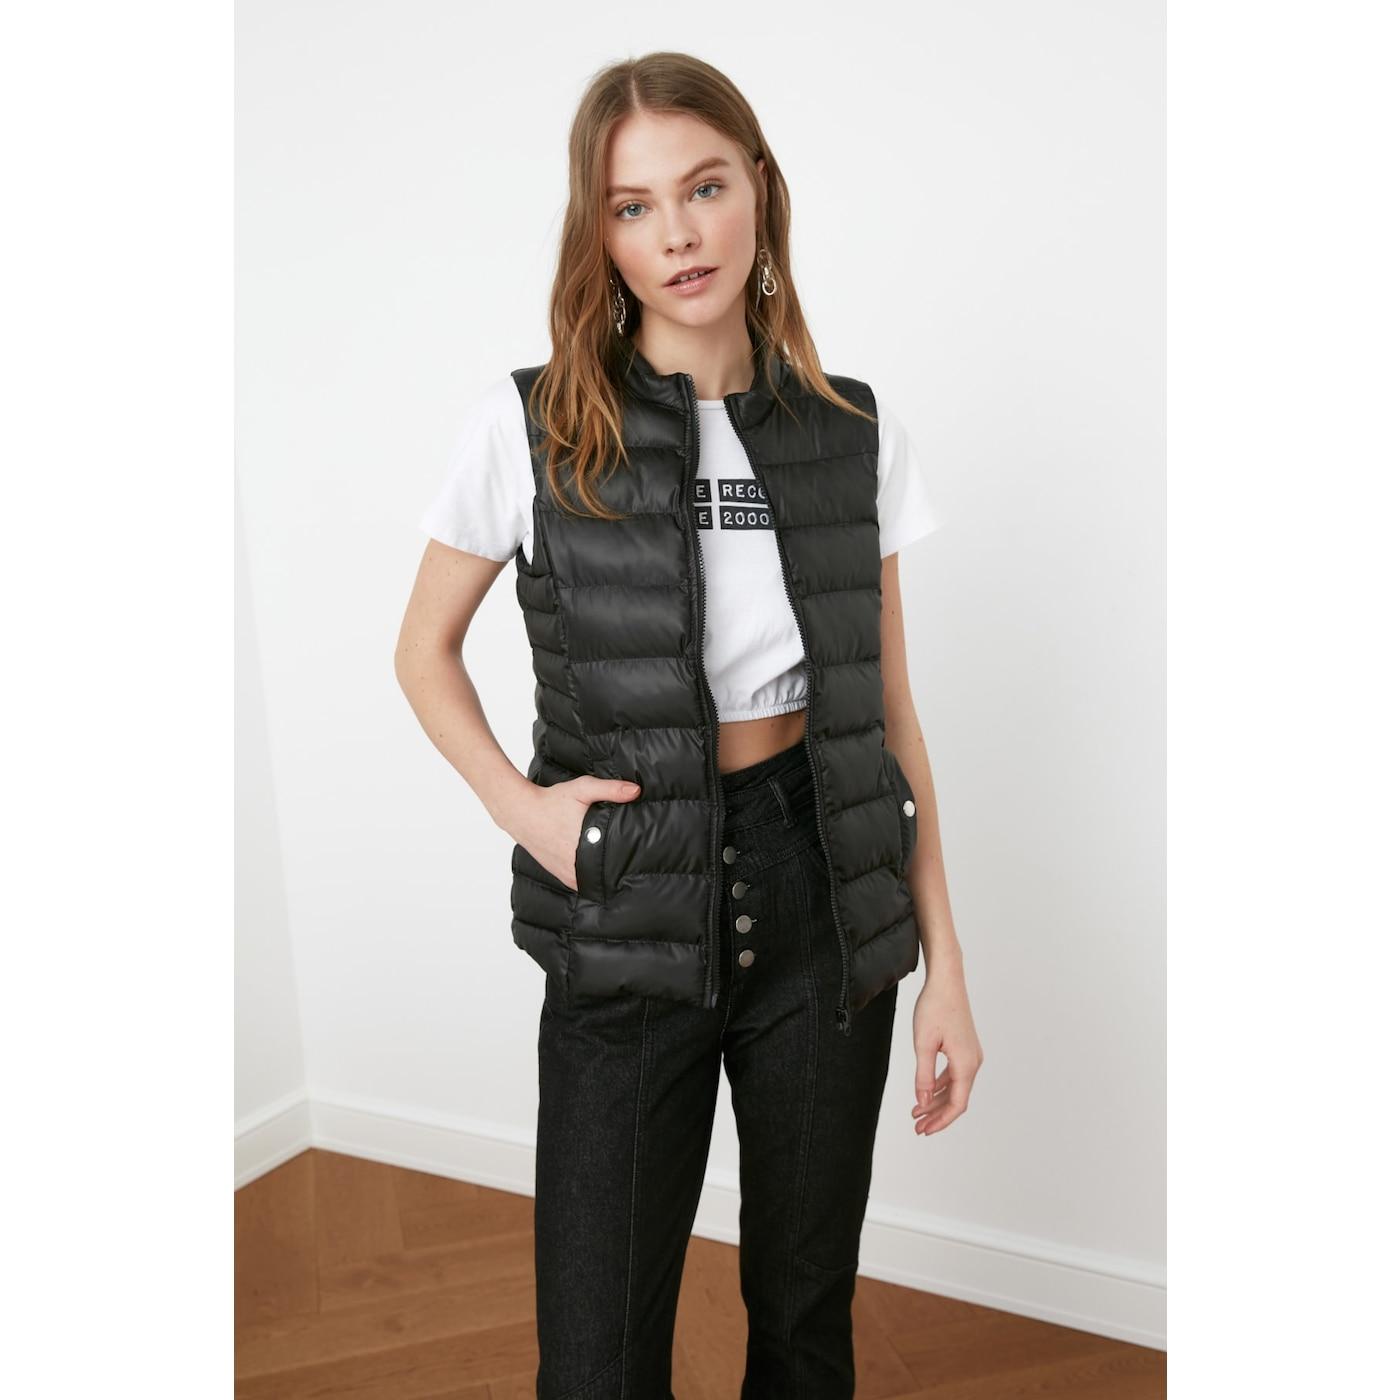 Trendyol Black Right Collar Inflatable Vest dámské M